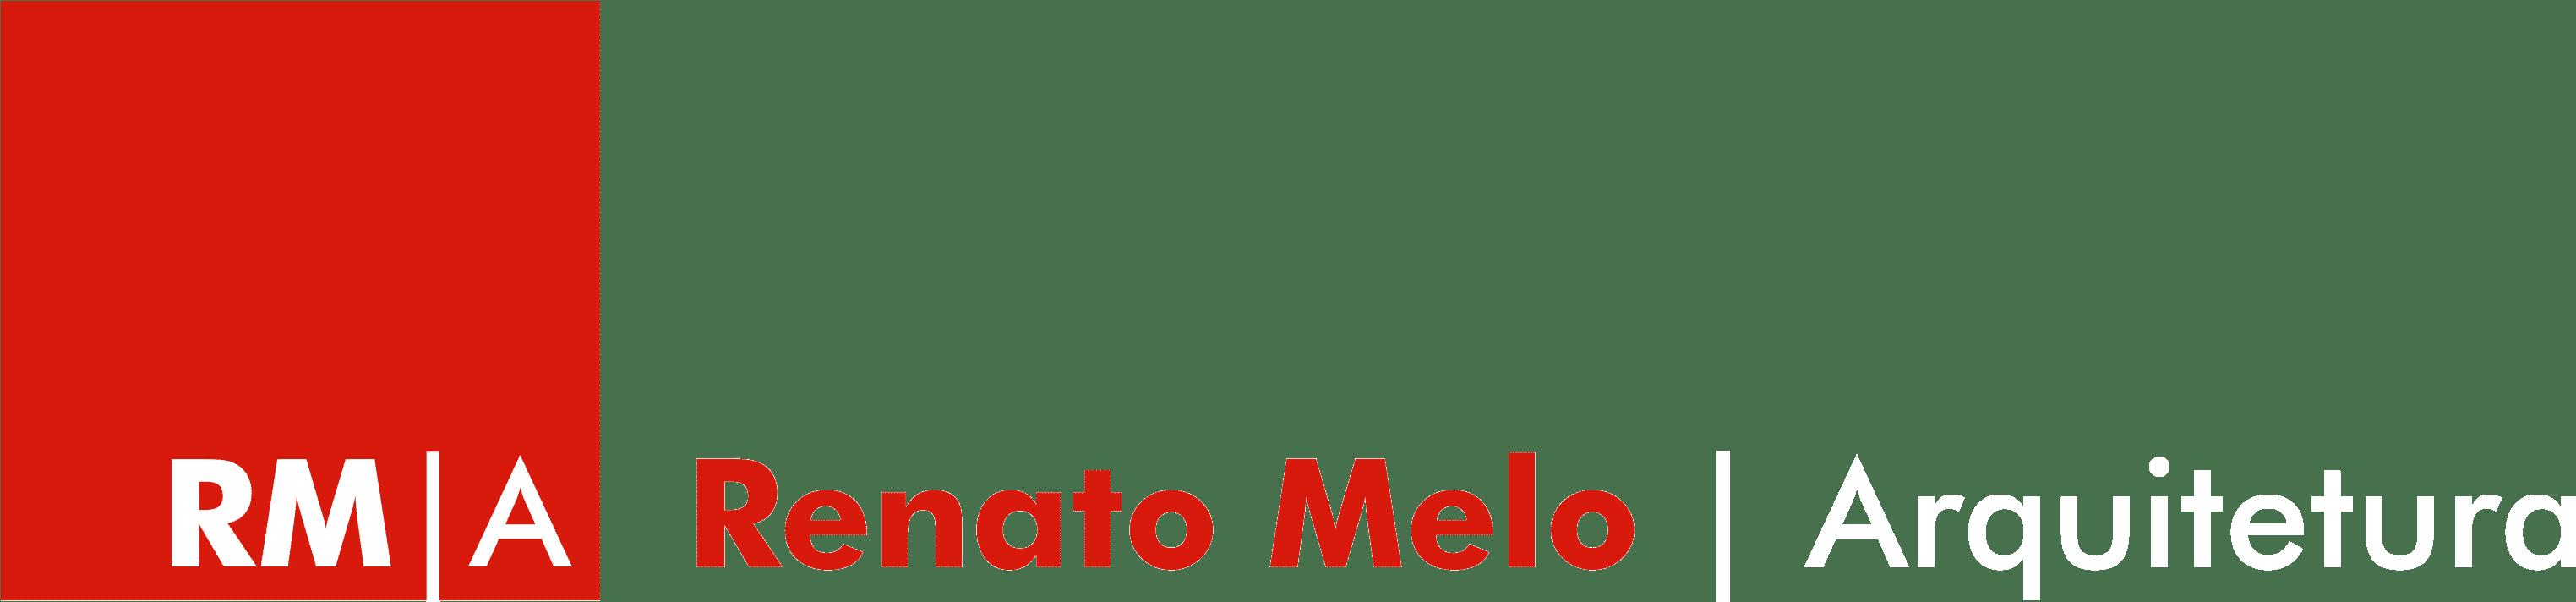 Renato Melo Arquitetura